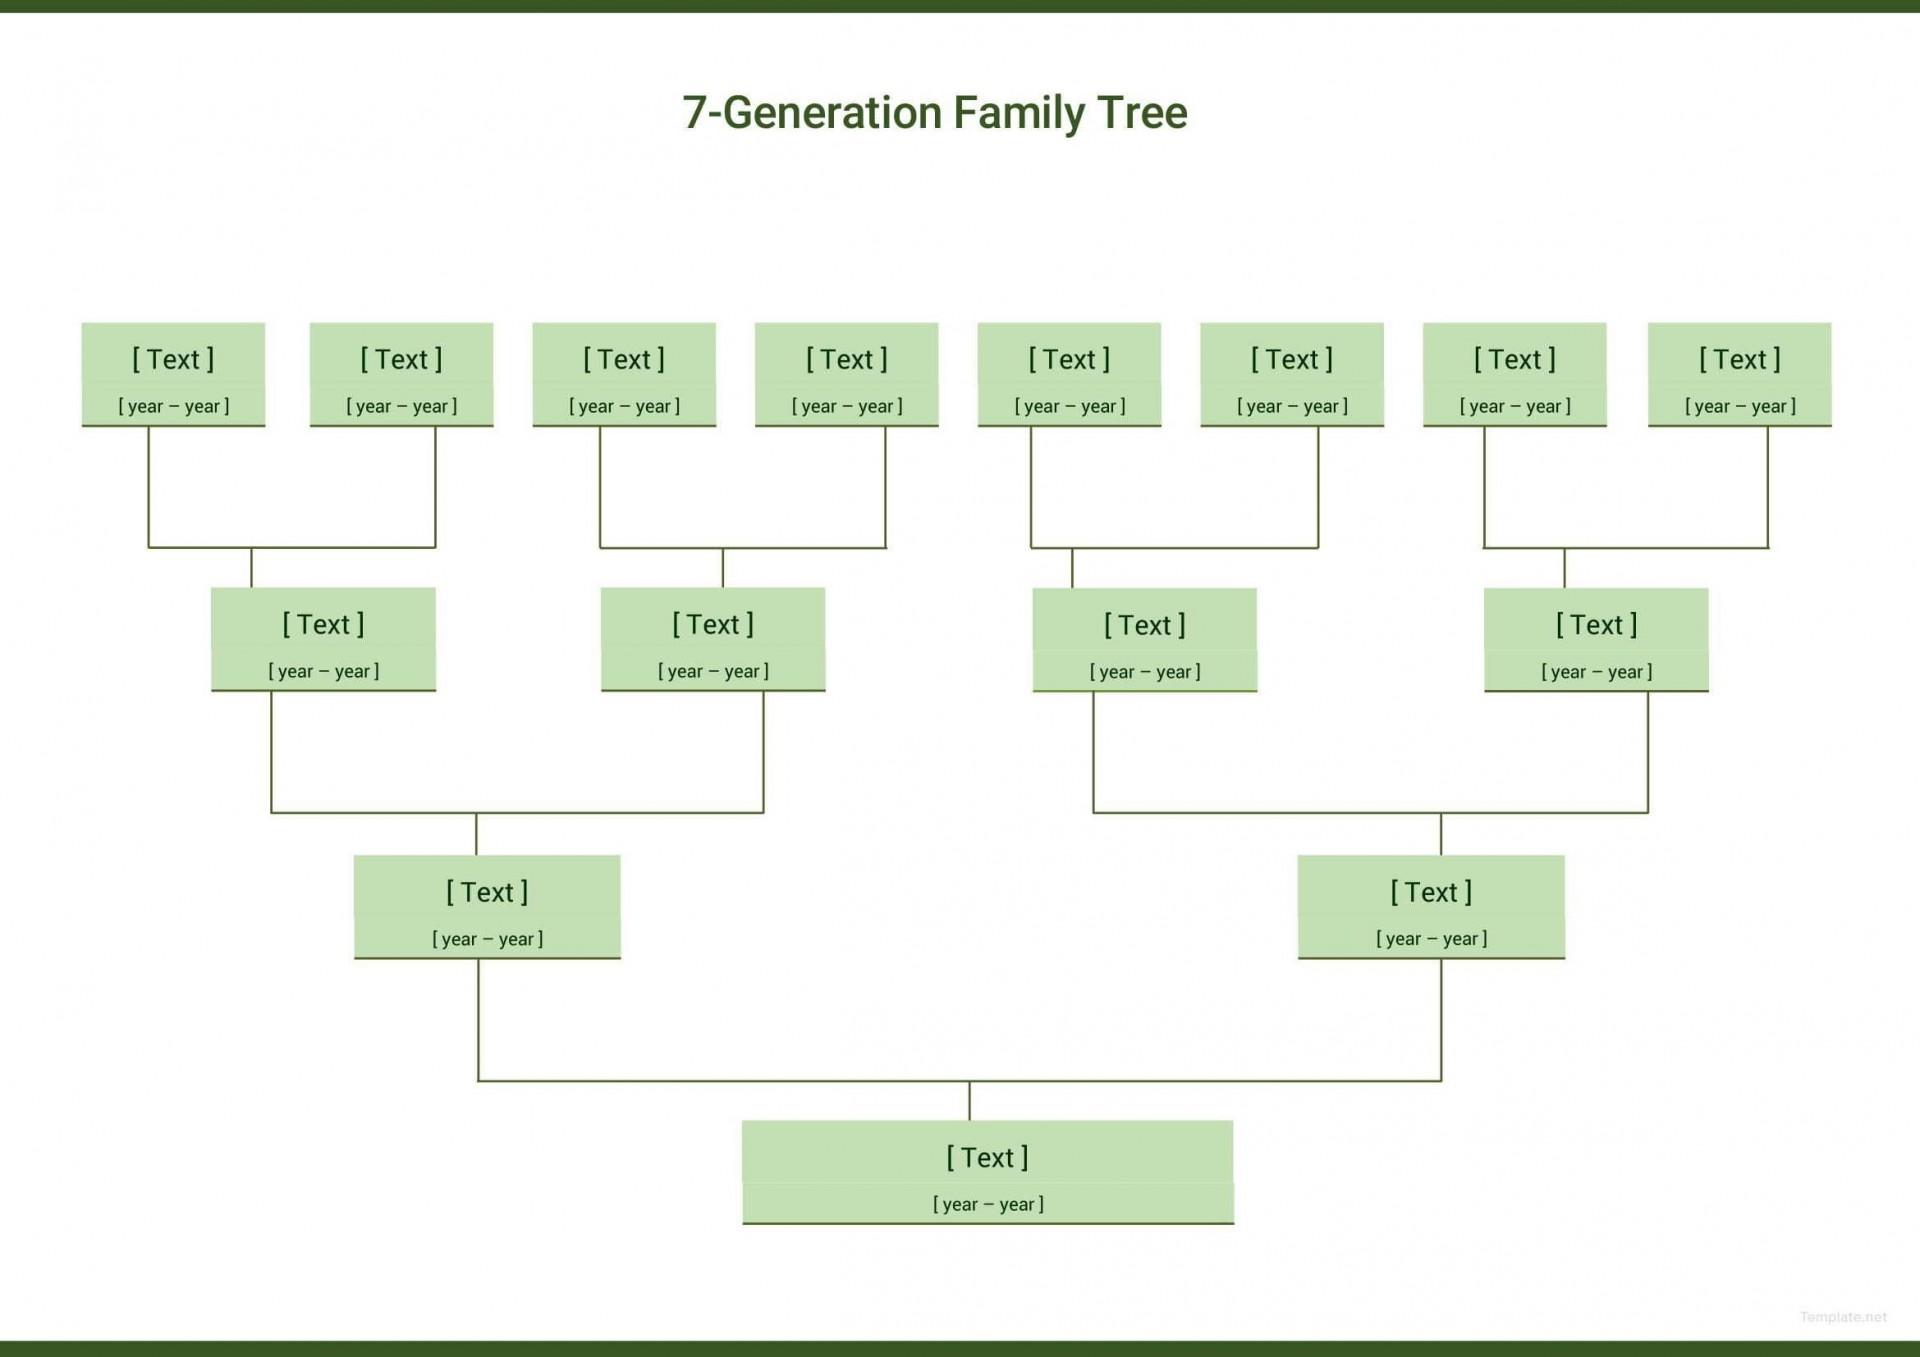 002 Impressive Editable Family Tree Template Online Free Idea 1920